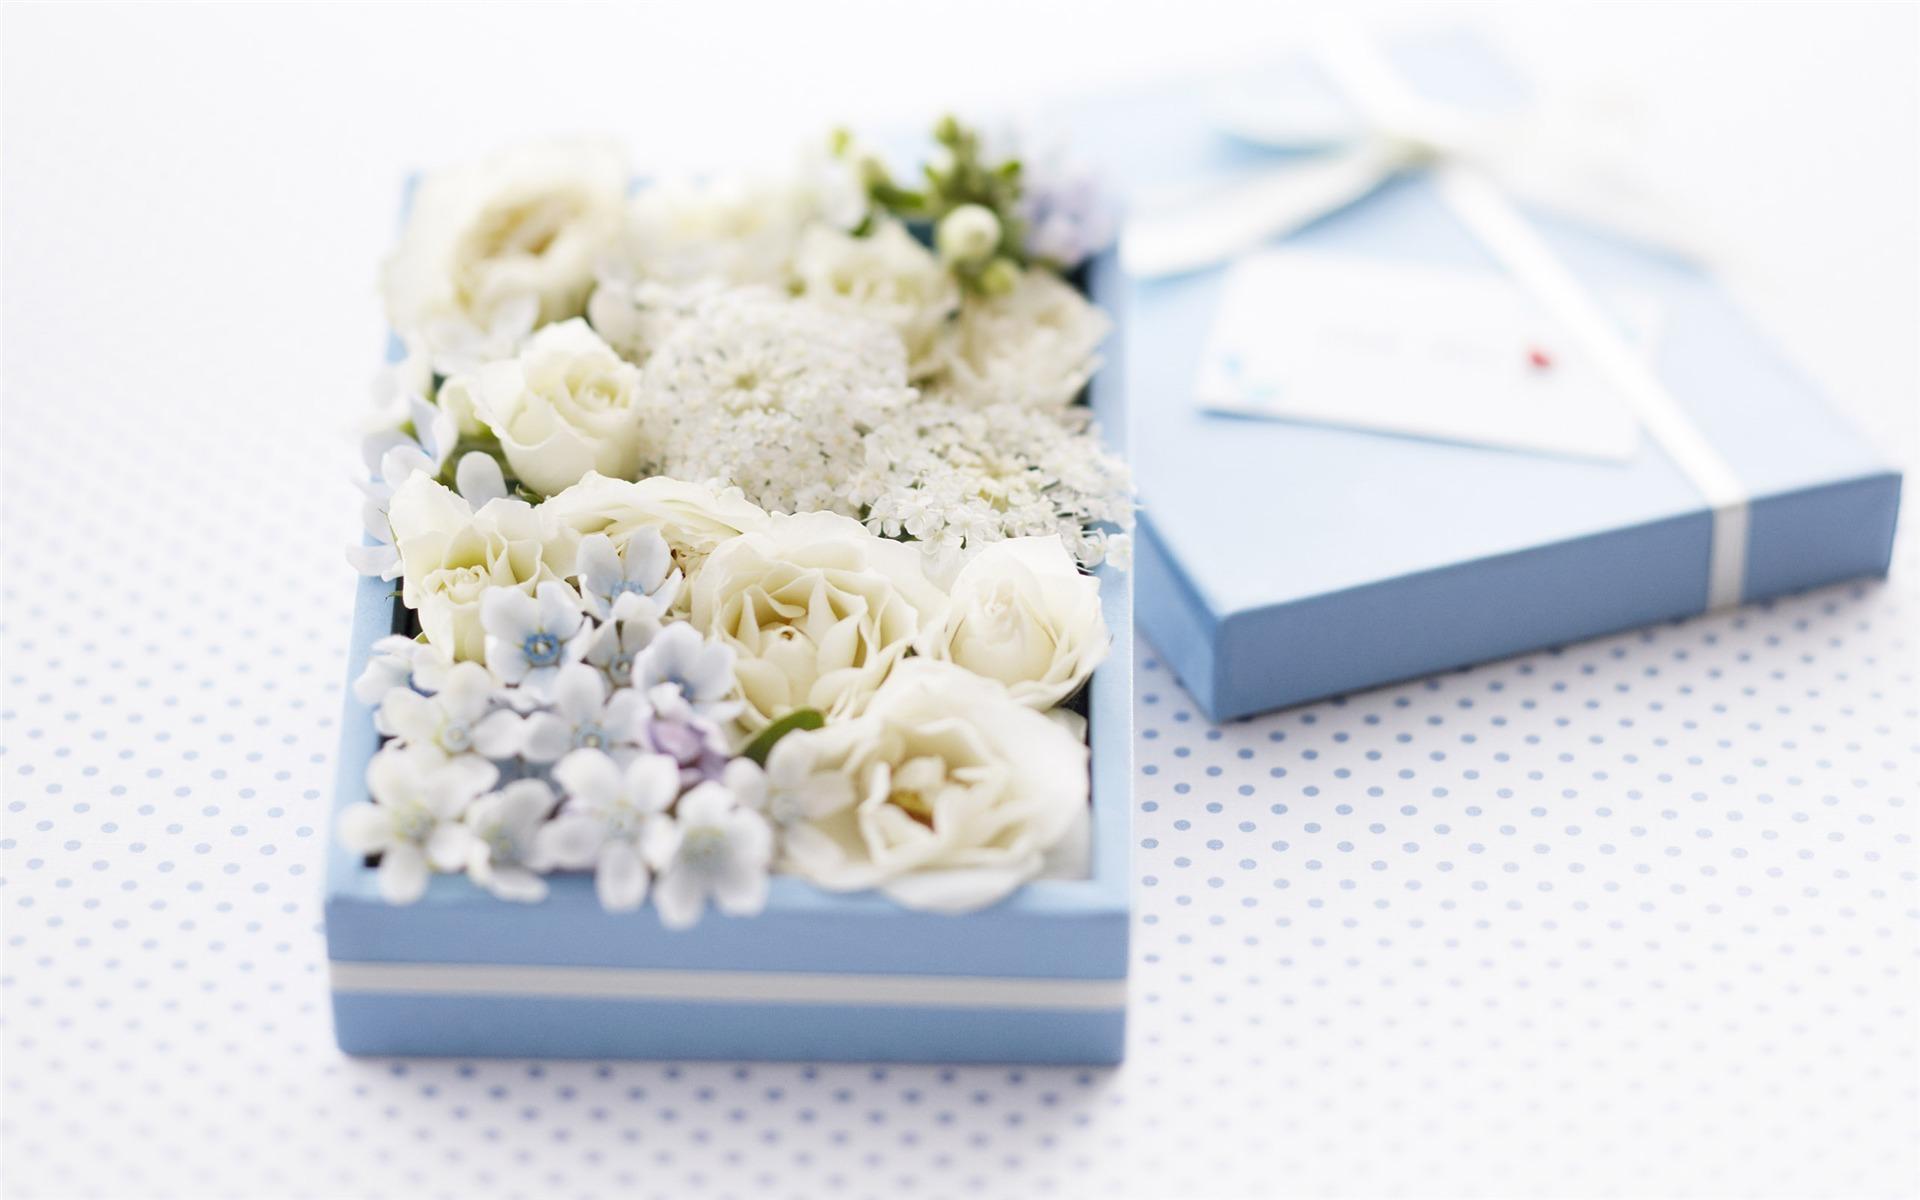 можете картинки на рабочий стол цветы в коробке оси симметрии